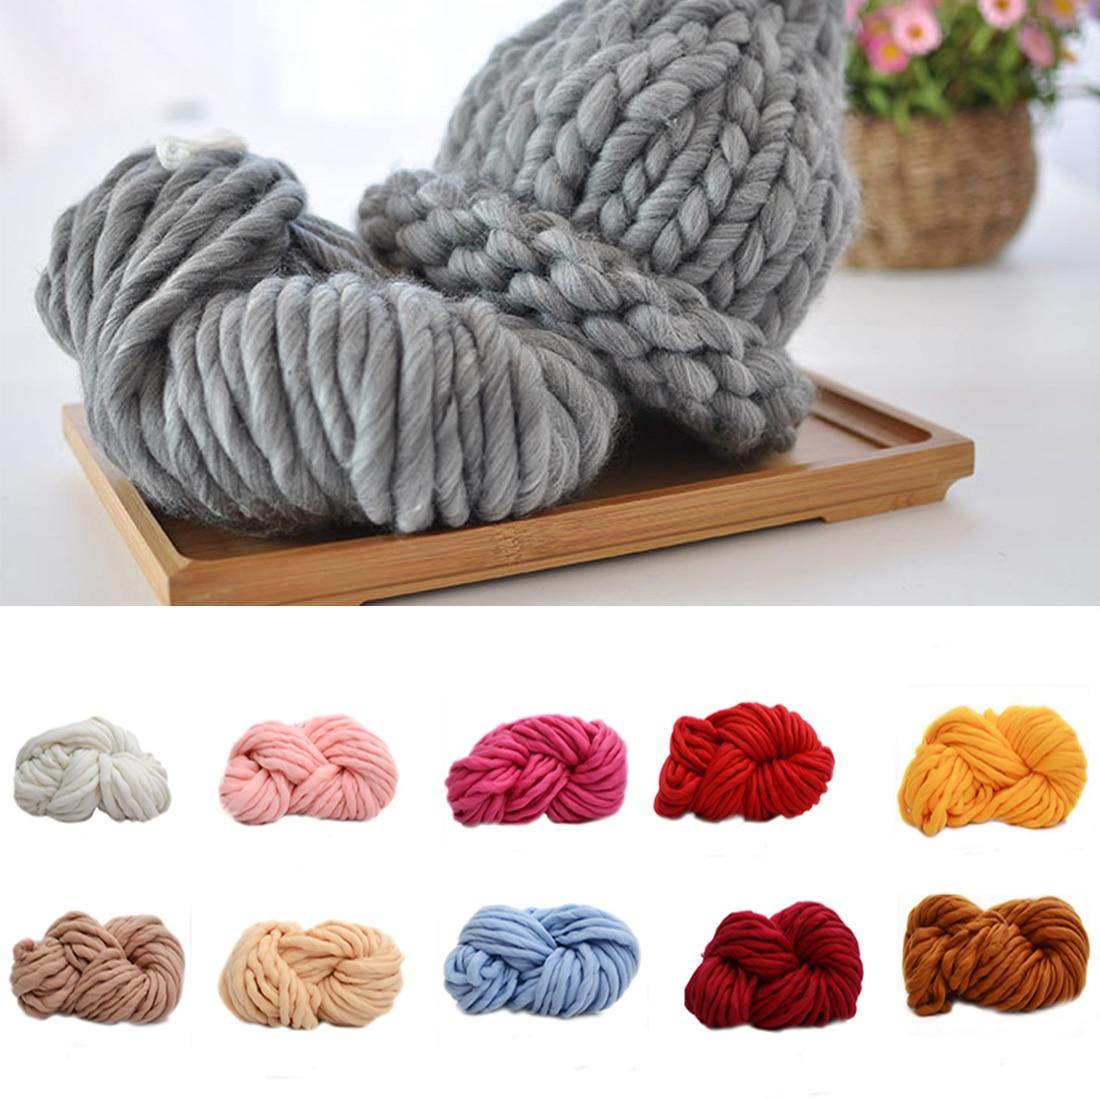 Hand Knitting Yarn : Online buy wholesale needles acrylic yarn from china